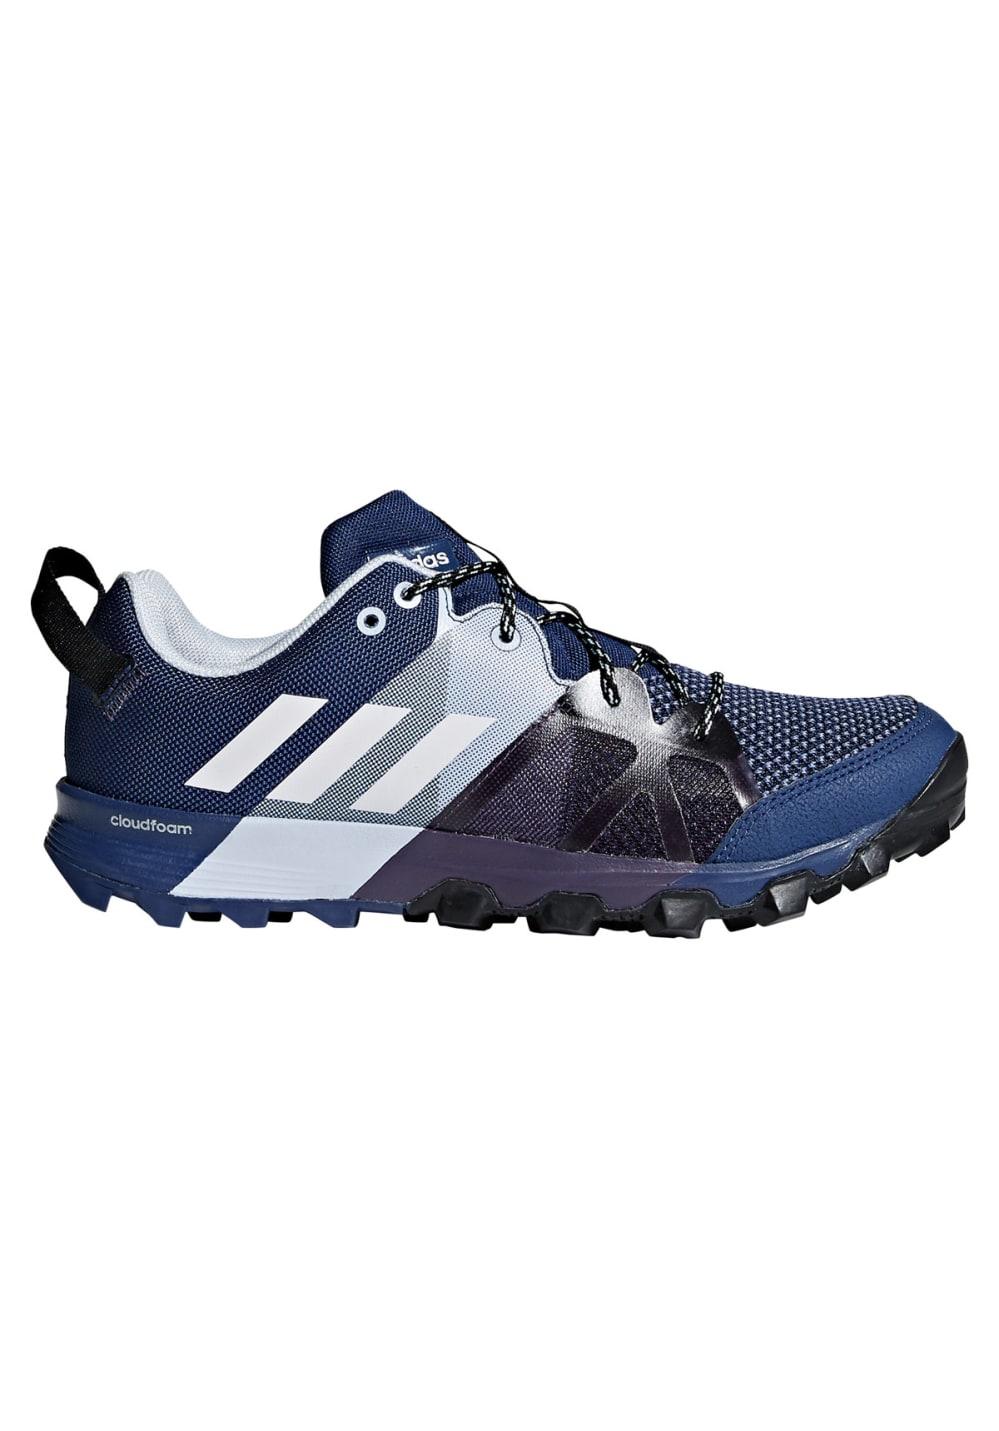 adidas Kanadia 8.1 Trail - Laufschuhe für Damen - Blau